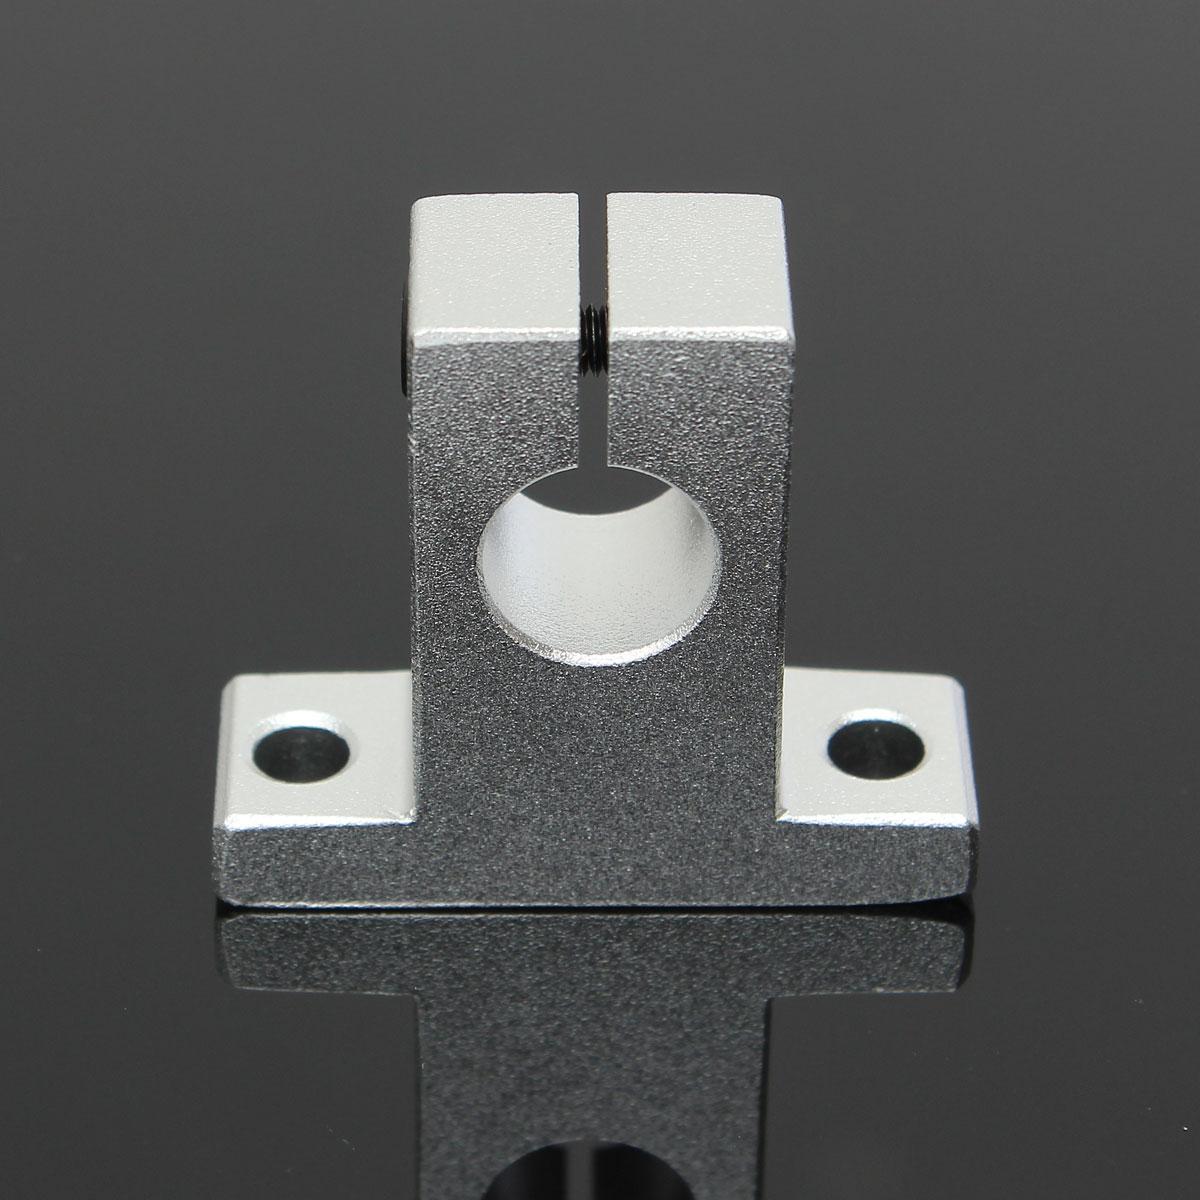 SK12 12mm Linear Bearing Rail Shaft Support Brackets XYZ Table CNC Router Accessories 42x14x37.5mm xyz table cnc milling sk20 20mm linear rail motion shaft support